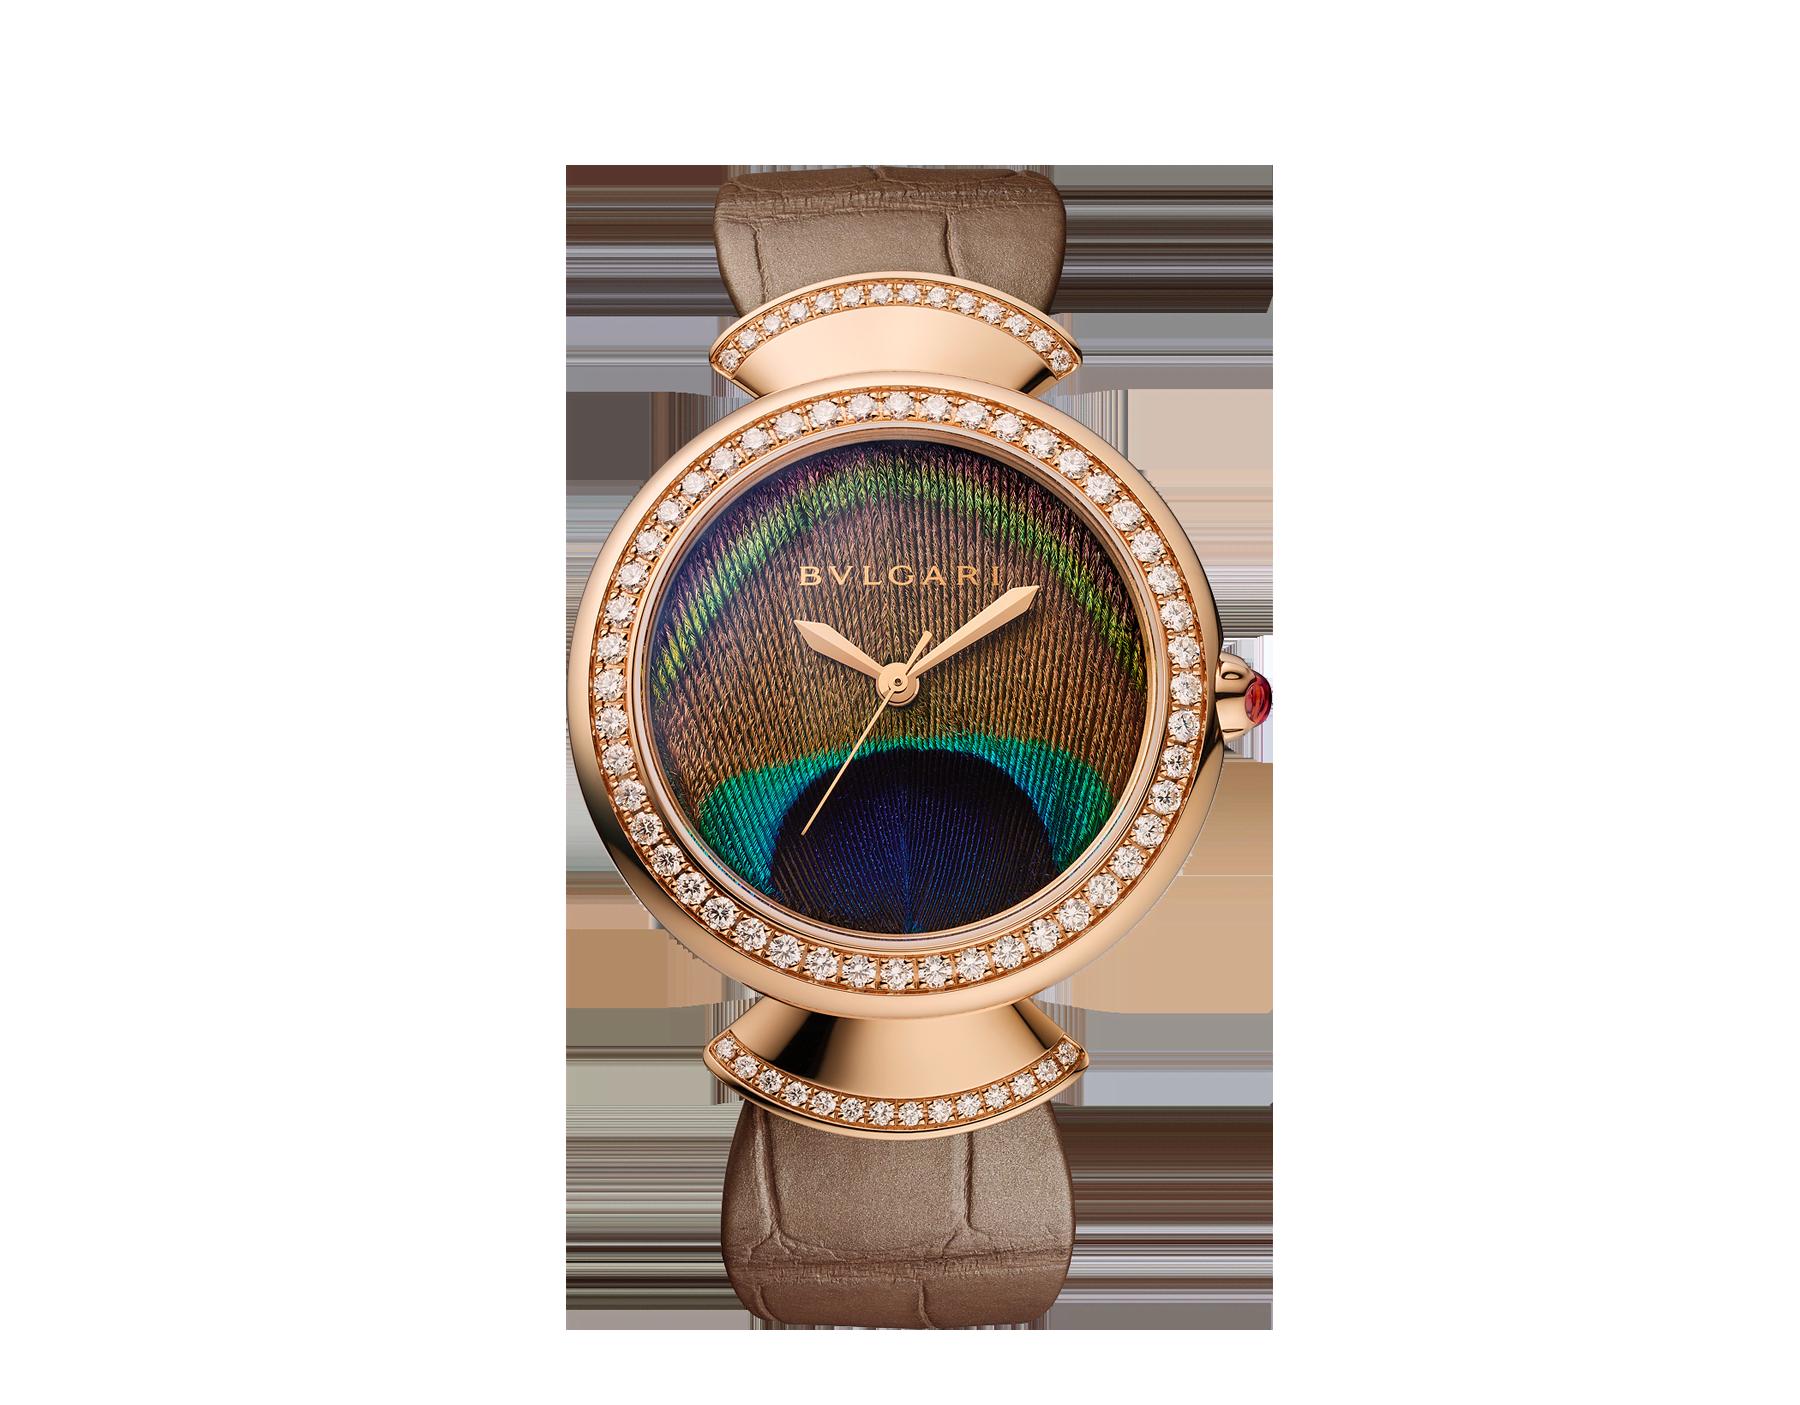 DIVAS' DREAM腕表,搭载品牌自制自动上链机械机芯,18K玫瑰金表壳,18K玫瑰金表圈和扇形链节,皆镶嵌明亮式切割钻石,天然孔雀羽毛表盘和闪亮米色鳄鱼皮表带 103139 image 1